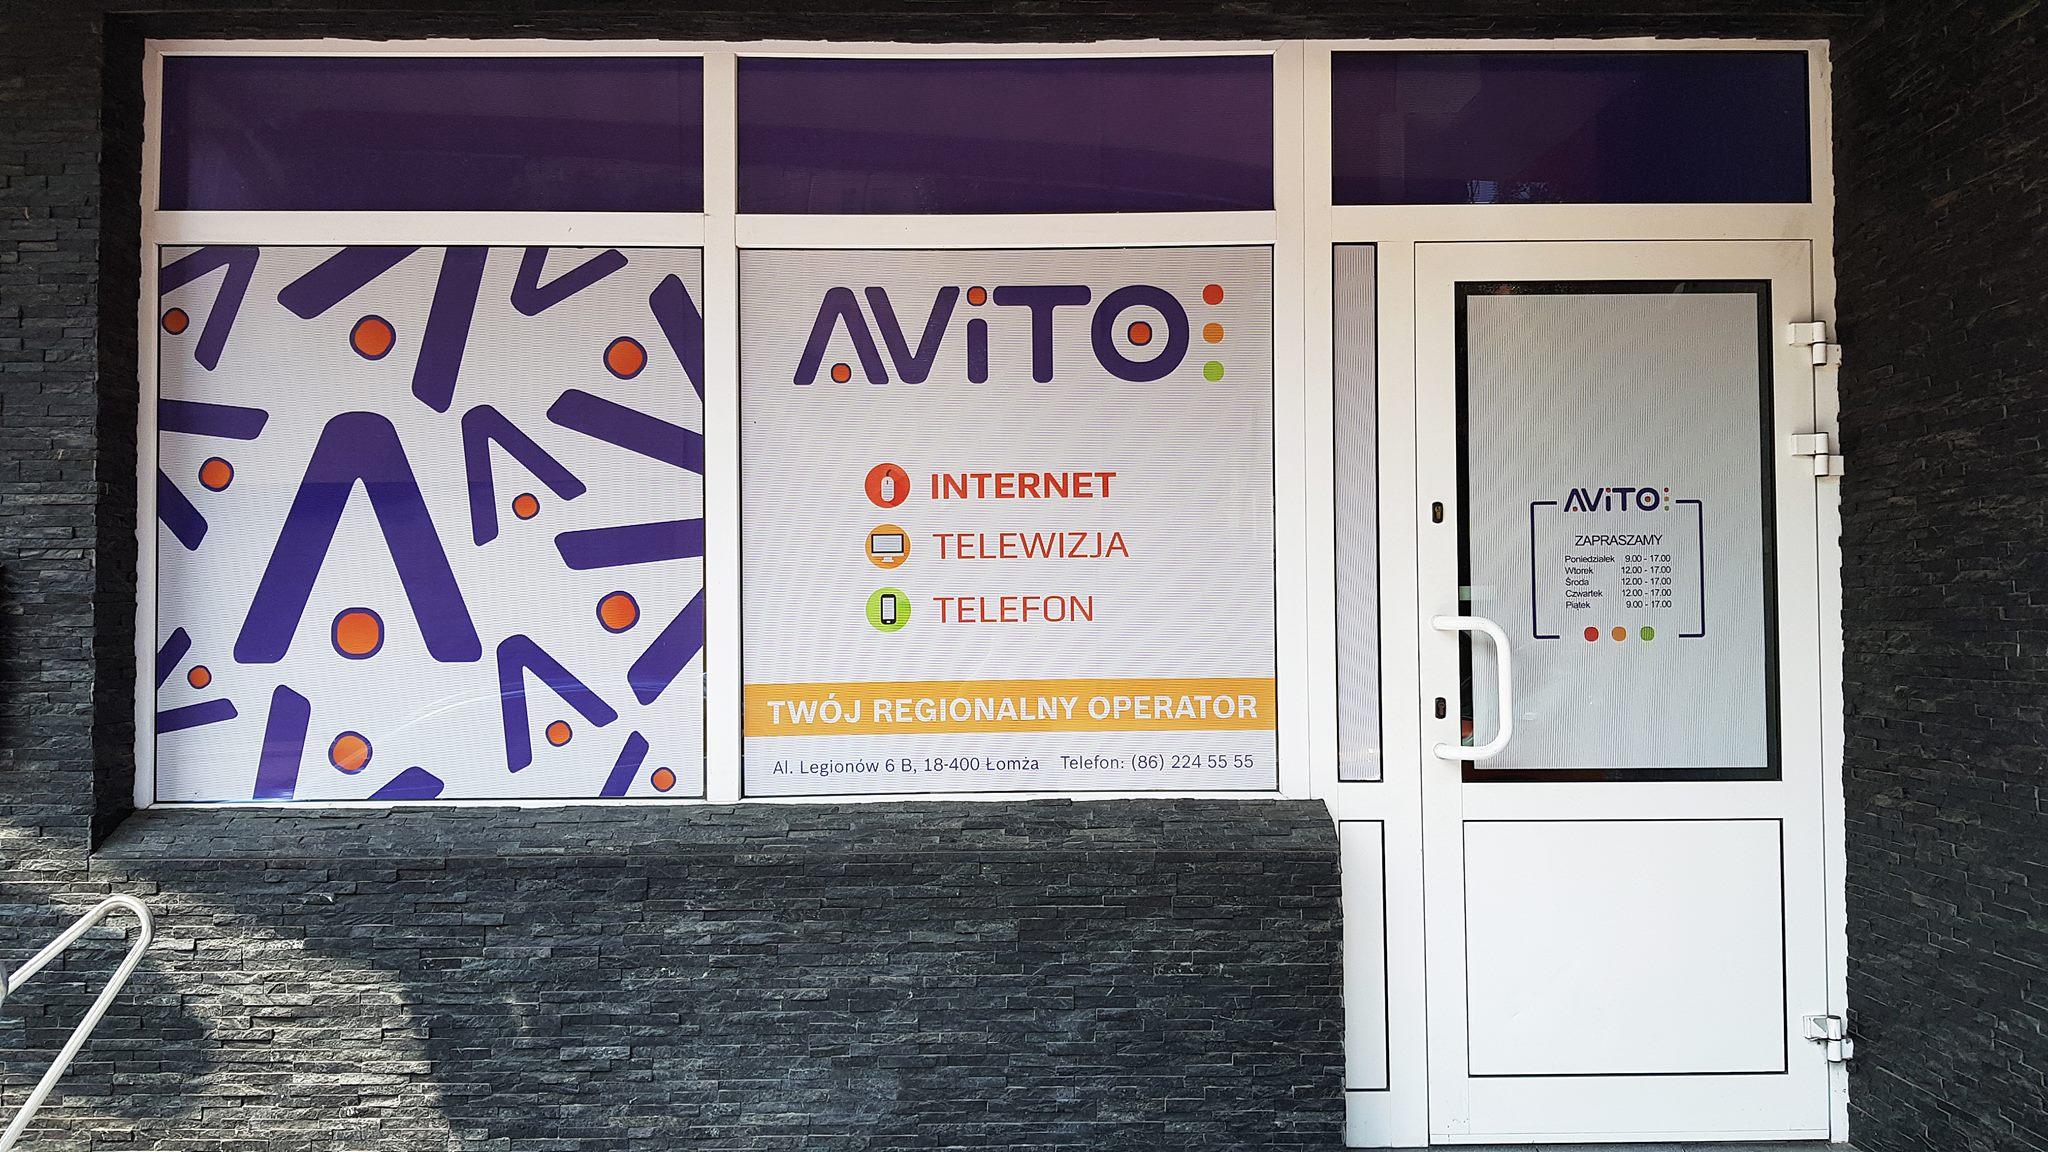 Oklejenie Witryn Lokalu Avito